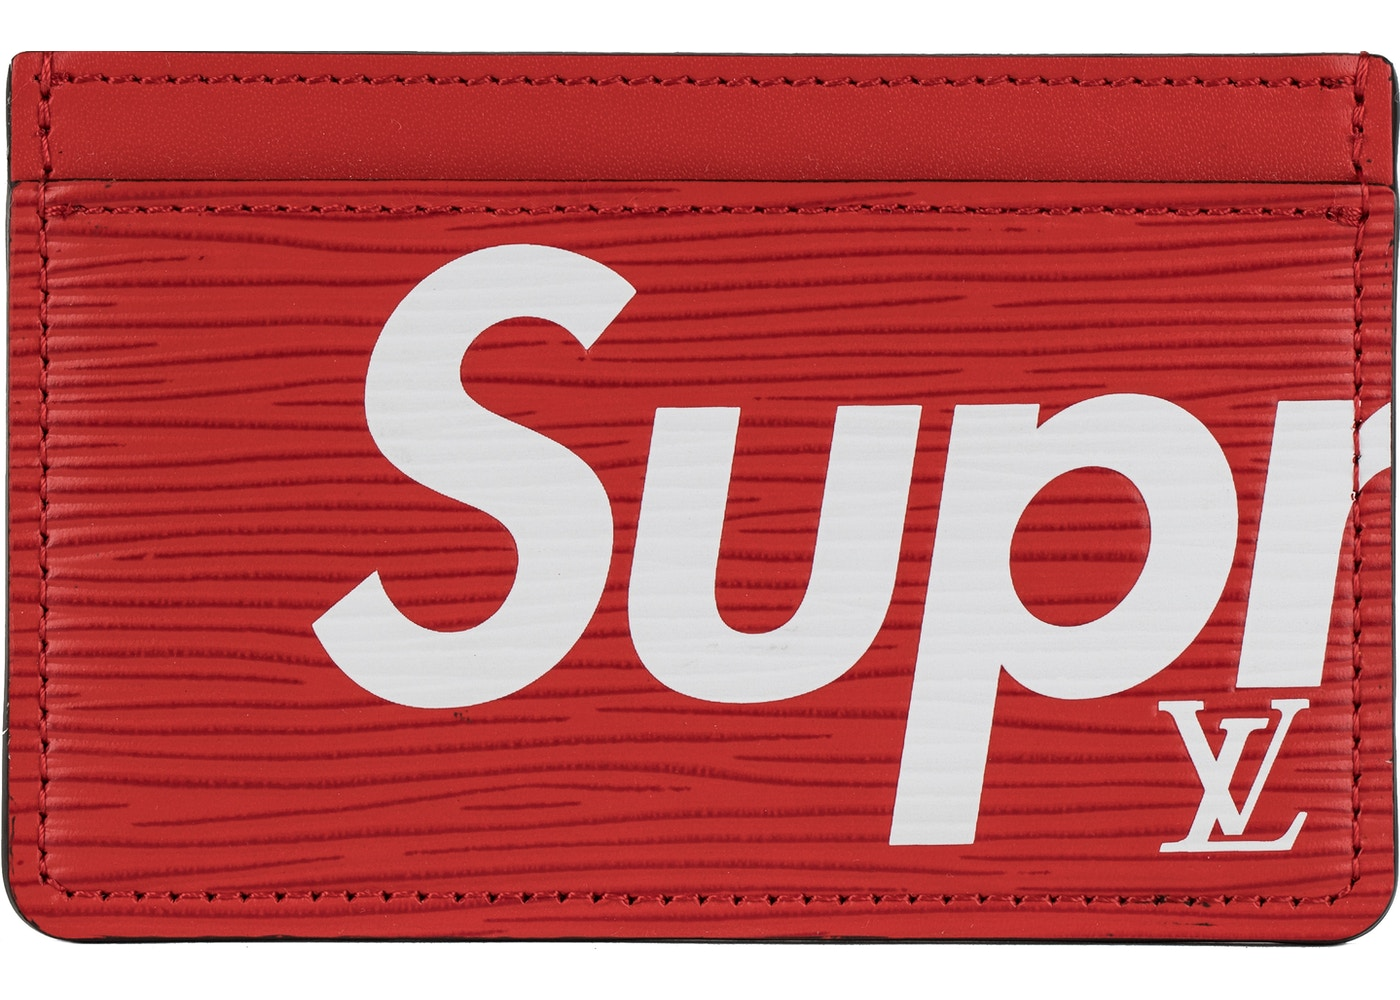 nuovo arrivo 9391a 07b80 Louis Vuitton x Supreme Porte Carte Simple Epi Red